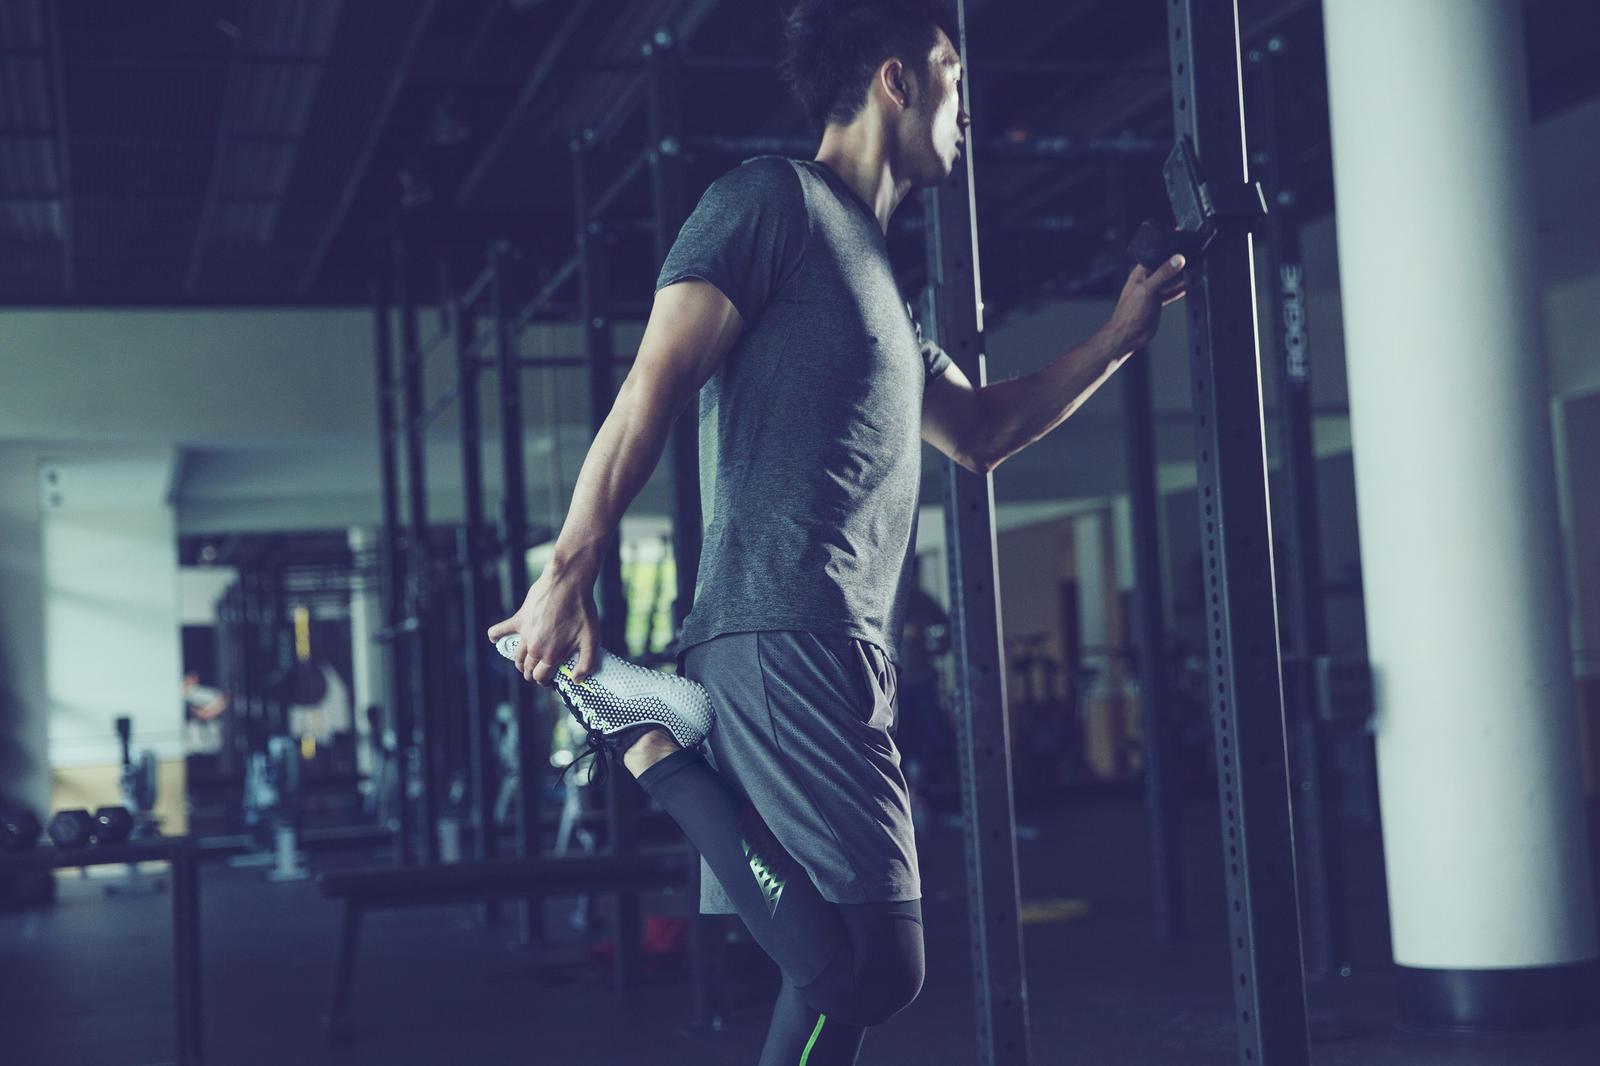 e5d400e821e57 Nike Free Trainer 1.0 Brings Barefoot Feel to Training - Nike News